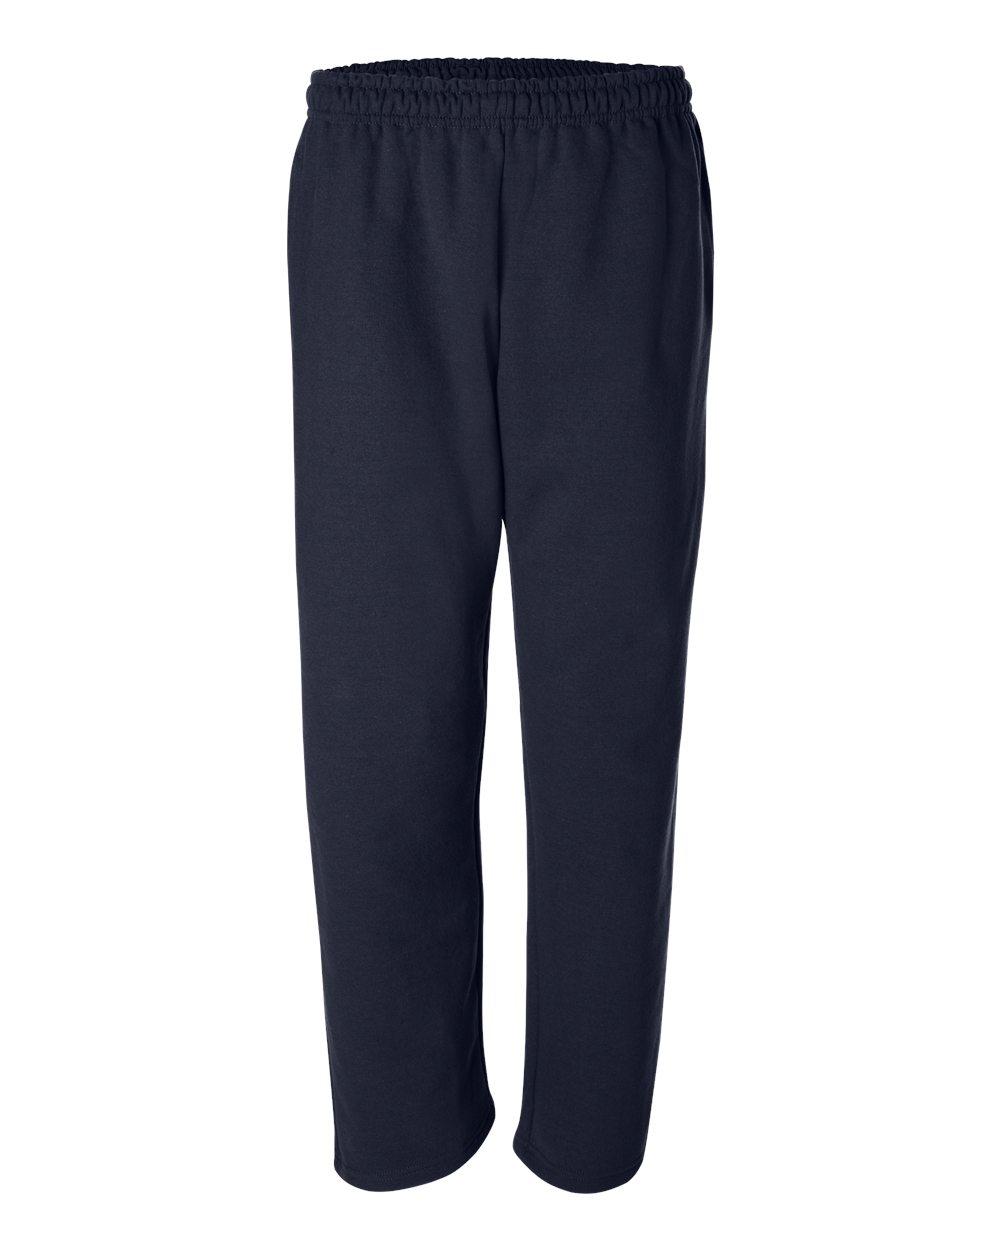 Gildan Heavy Blend Open Bottom Pocketed Sweatpants